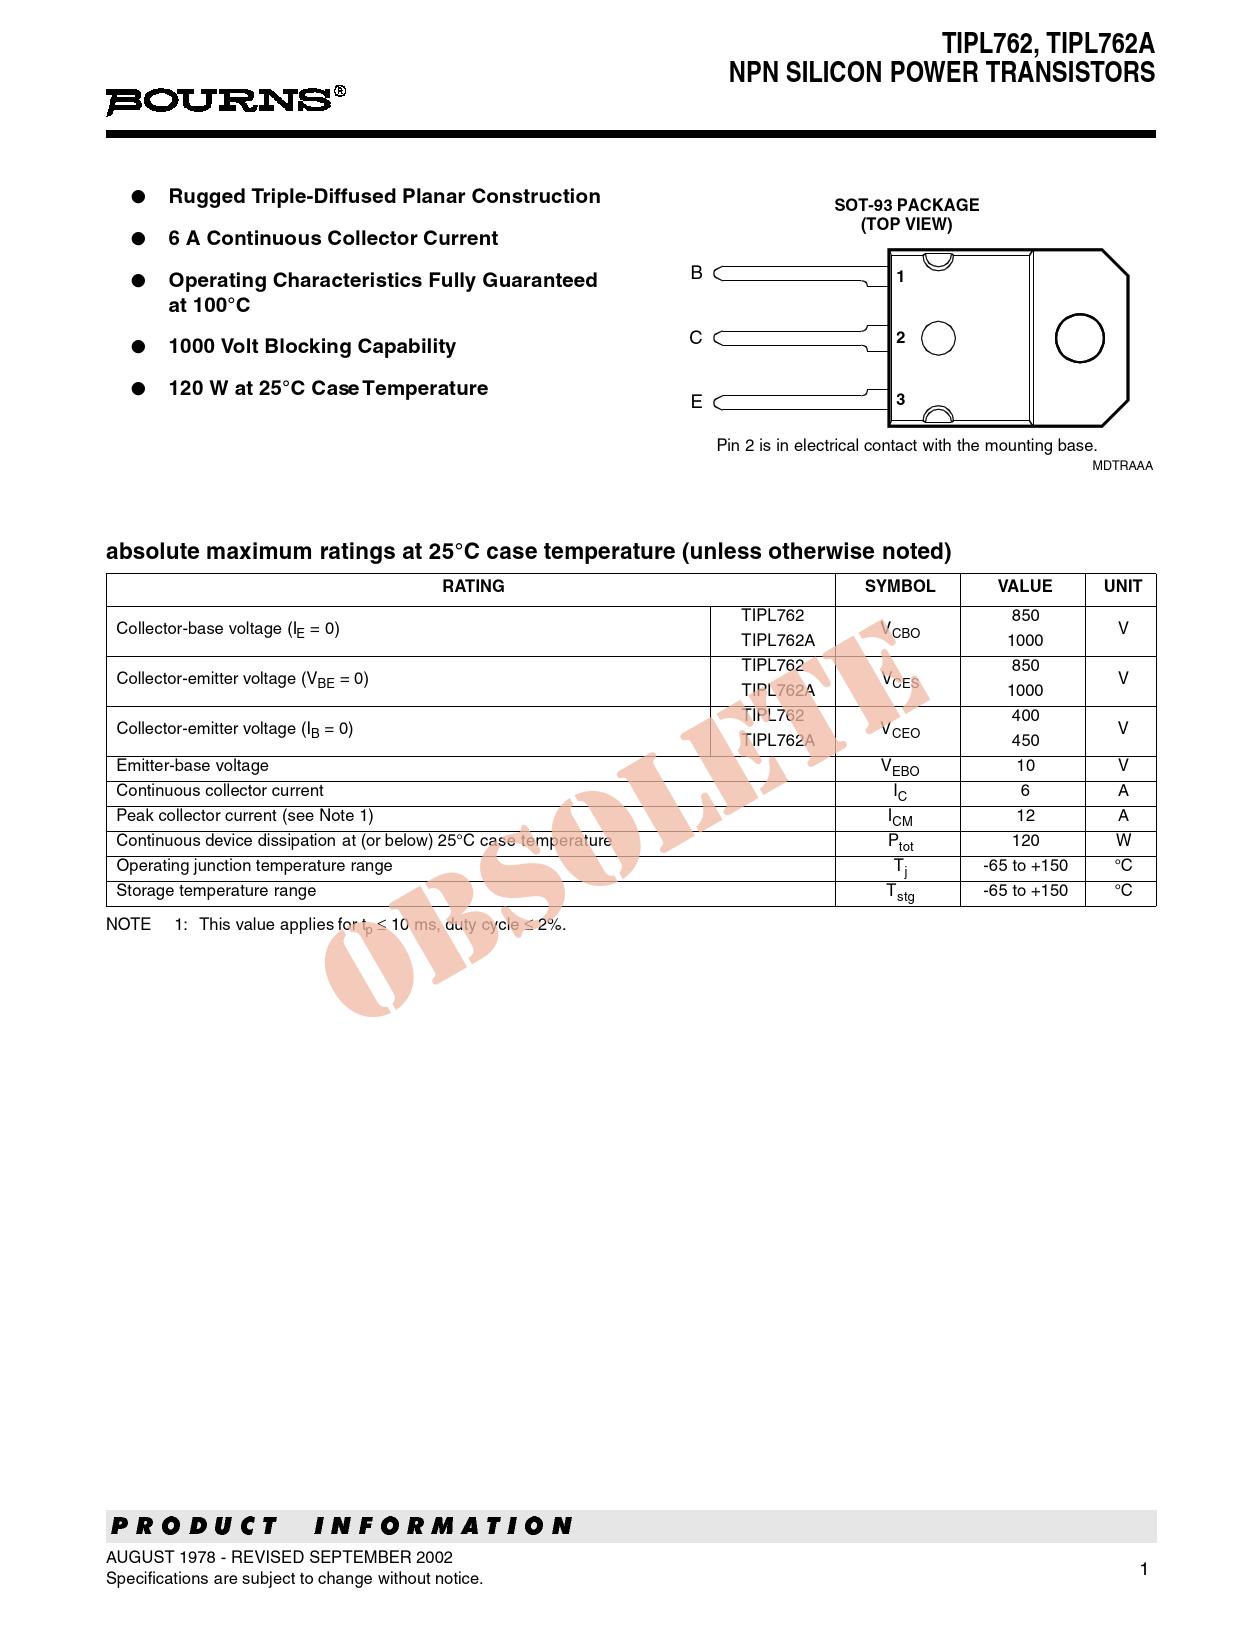 Datasheet TIPL762 Bourns